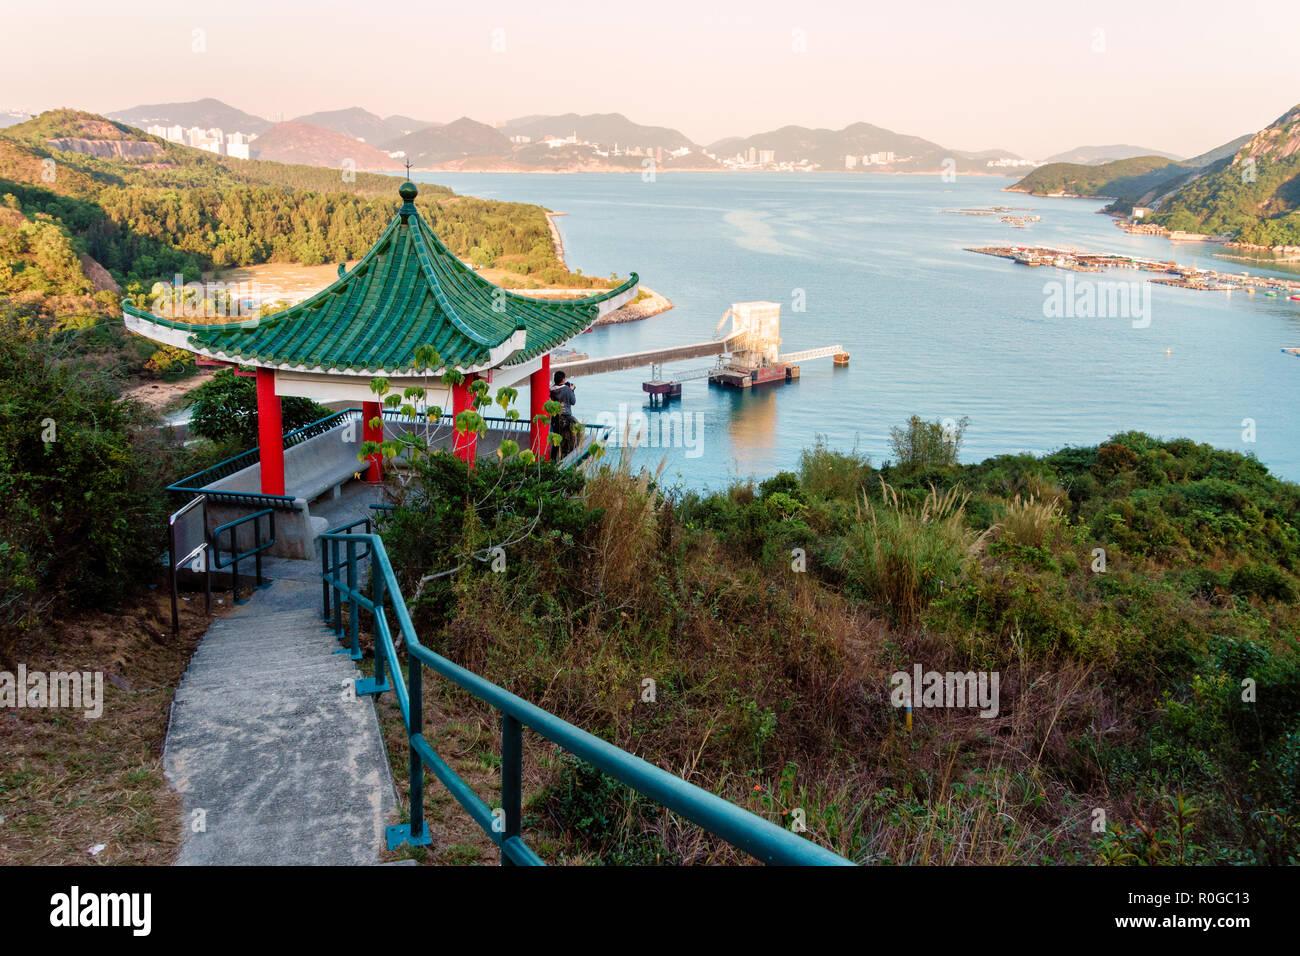 Sok Kwu Wan bay scenery from Family Walk trail on Lamma Island, Hong Kong. Chinese pagoda on observation platform - Stock Image